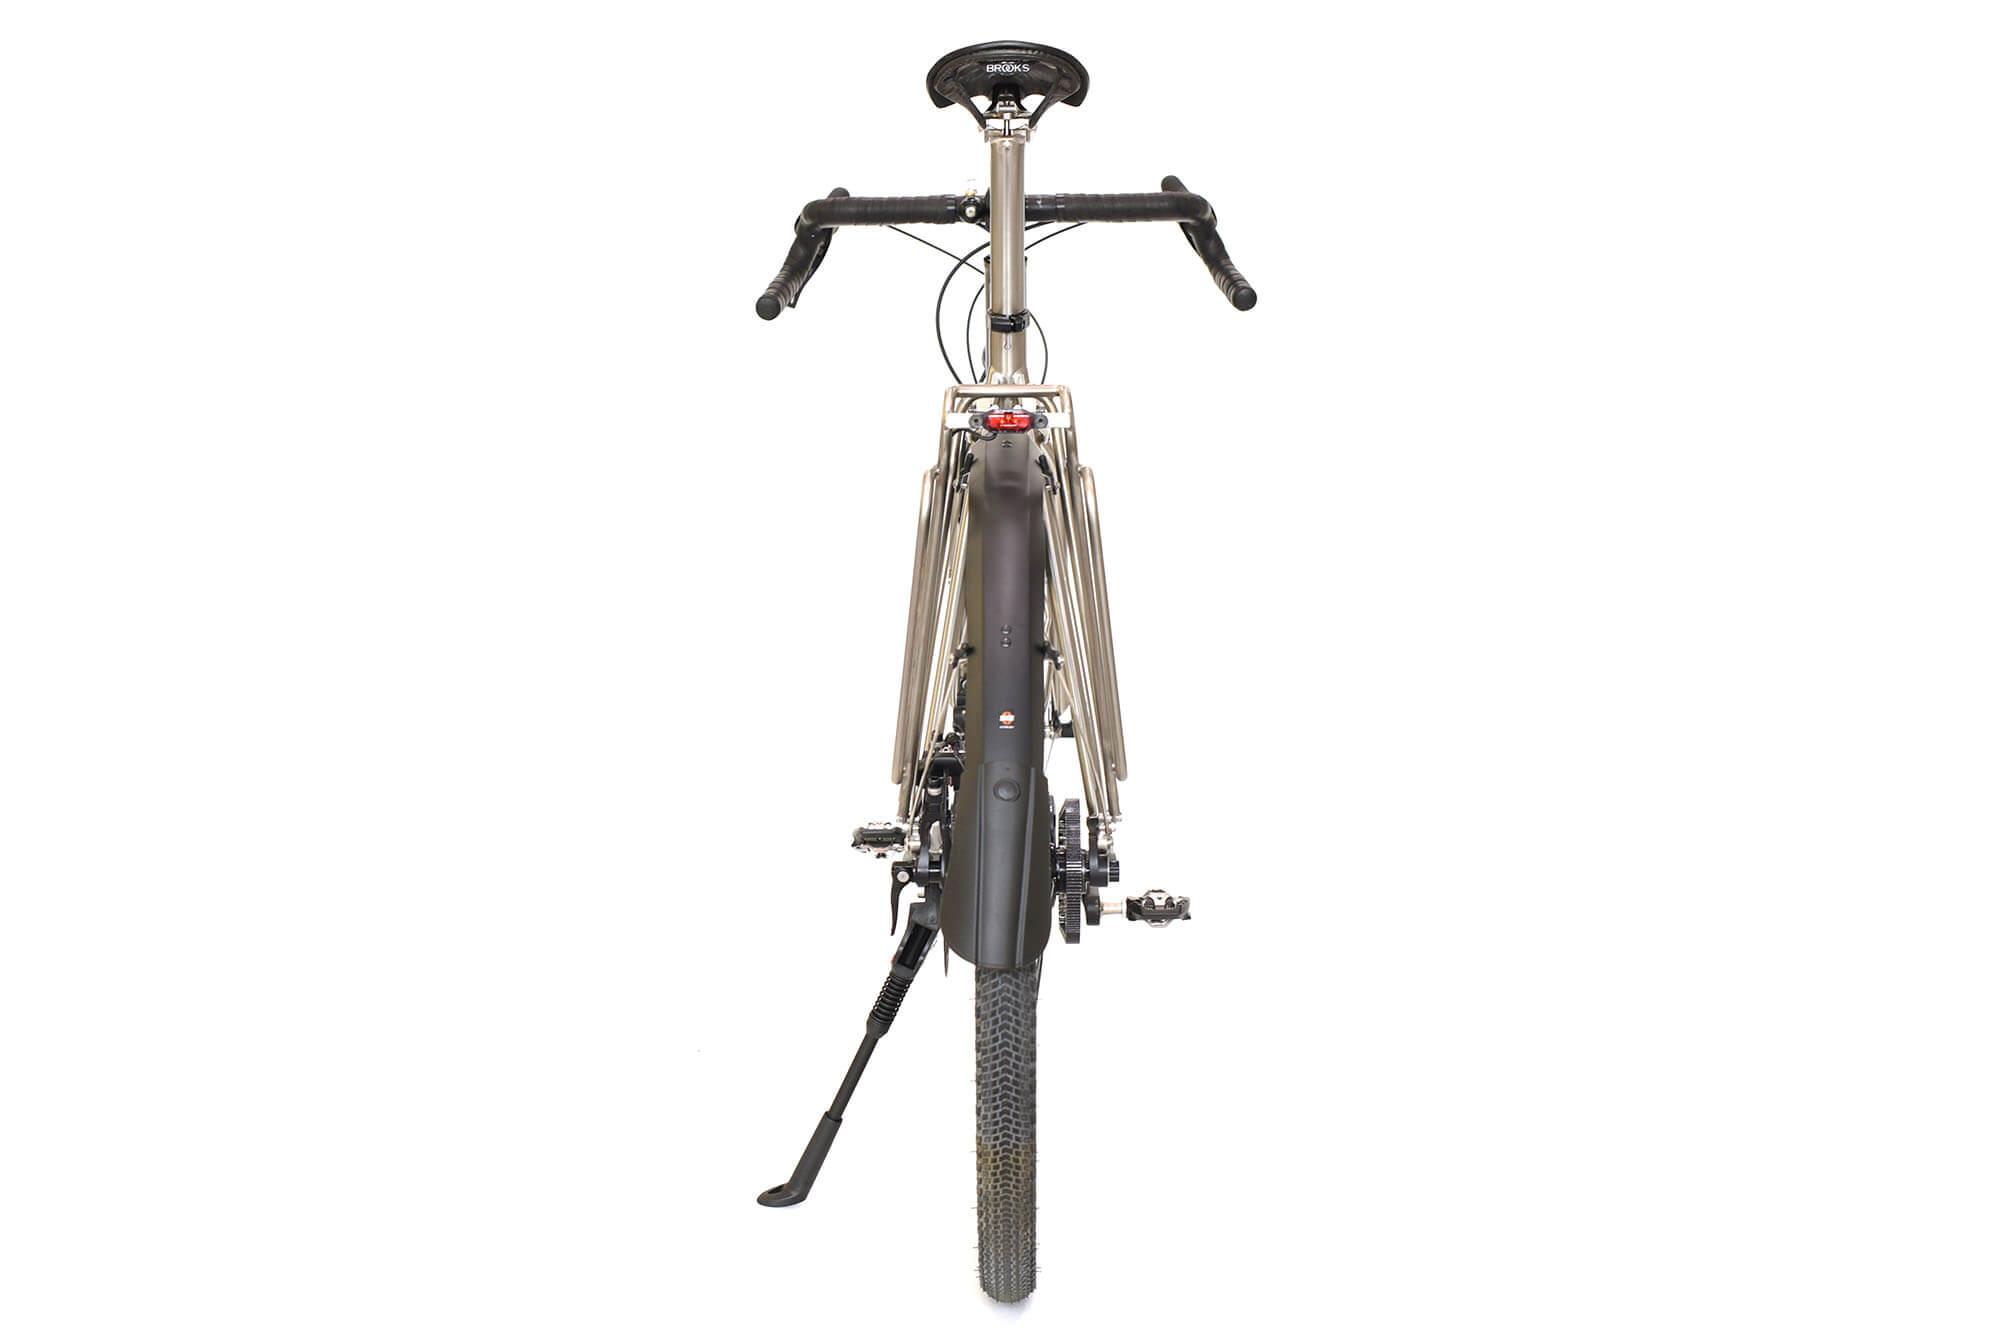 Adrian´s s Pinion Gravel Allroad Titan Bike 4